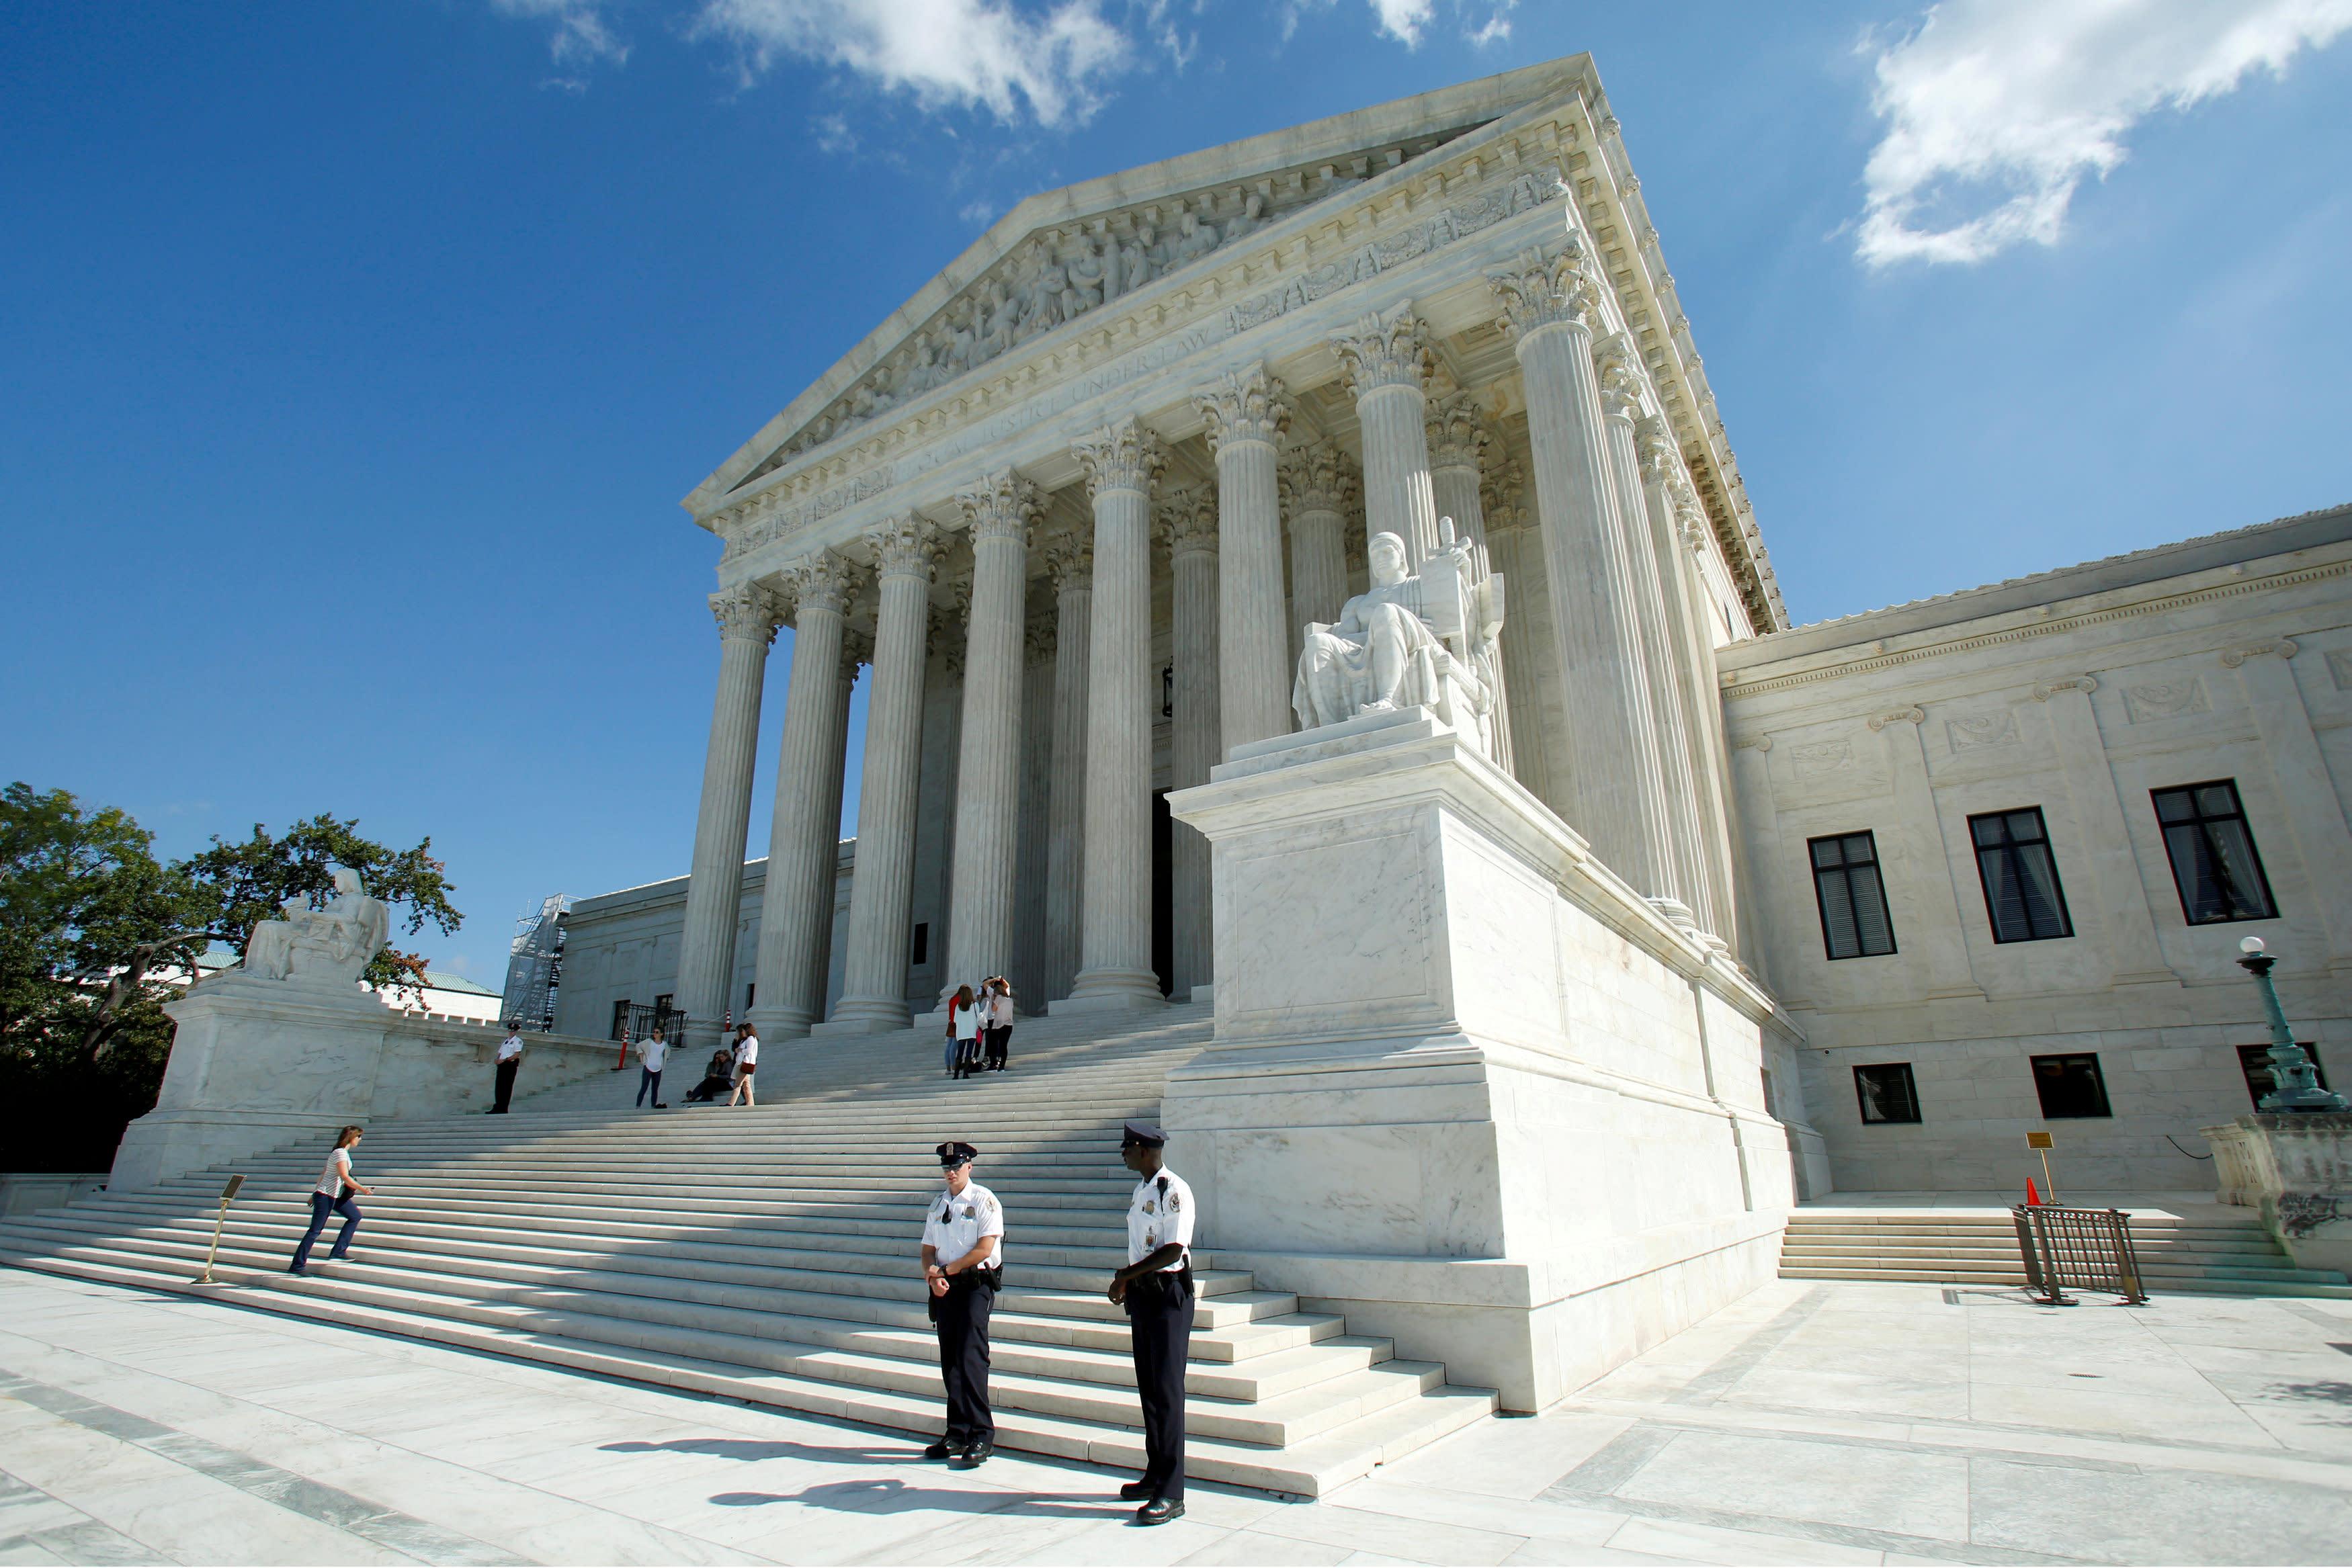 FILE PHOTO: U.S. Supreme Court is seen in Washington, U.S., October 3, 2016. REUTERS/Yuri Gripas/File Photo